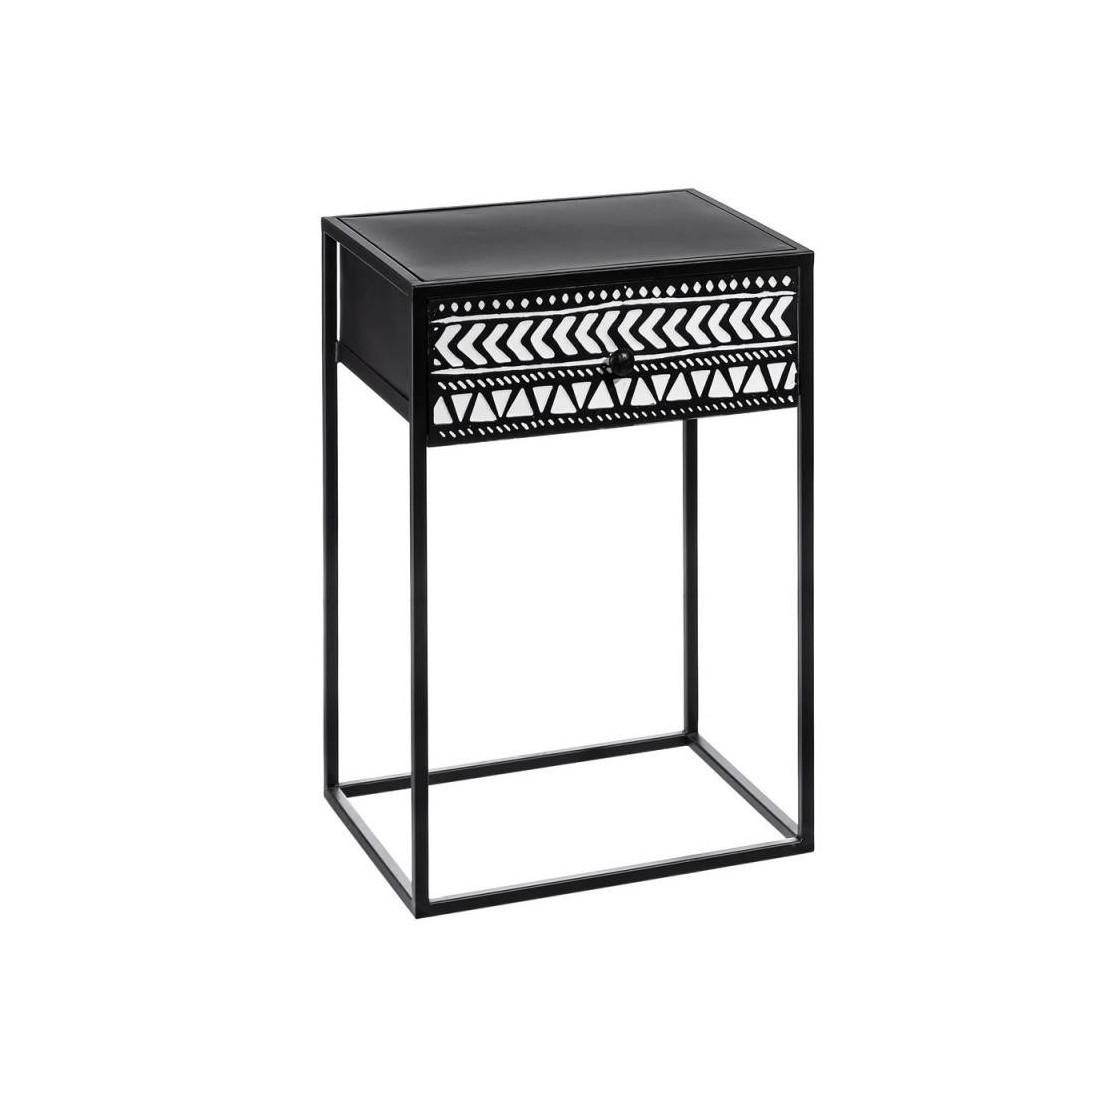 Table d 39 appoint 1 tiroir m tal noir blanc africa petits meubles - Table d appoint malm ...